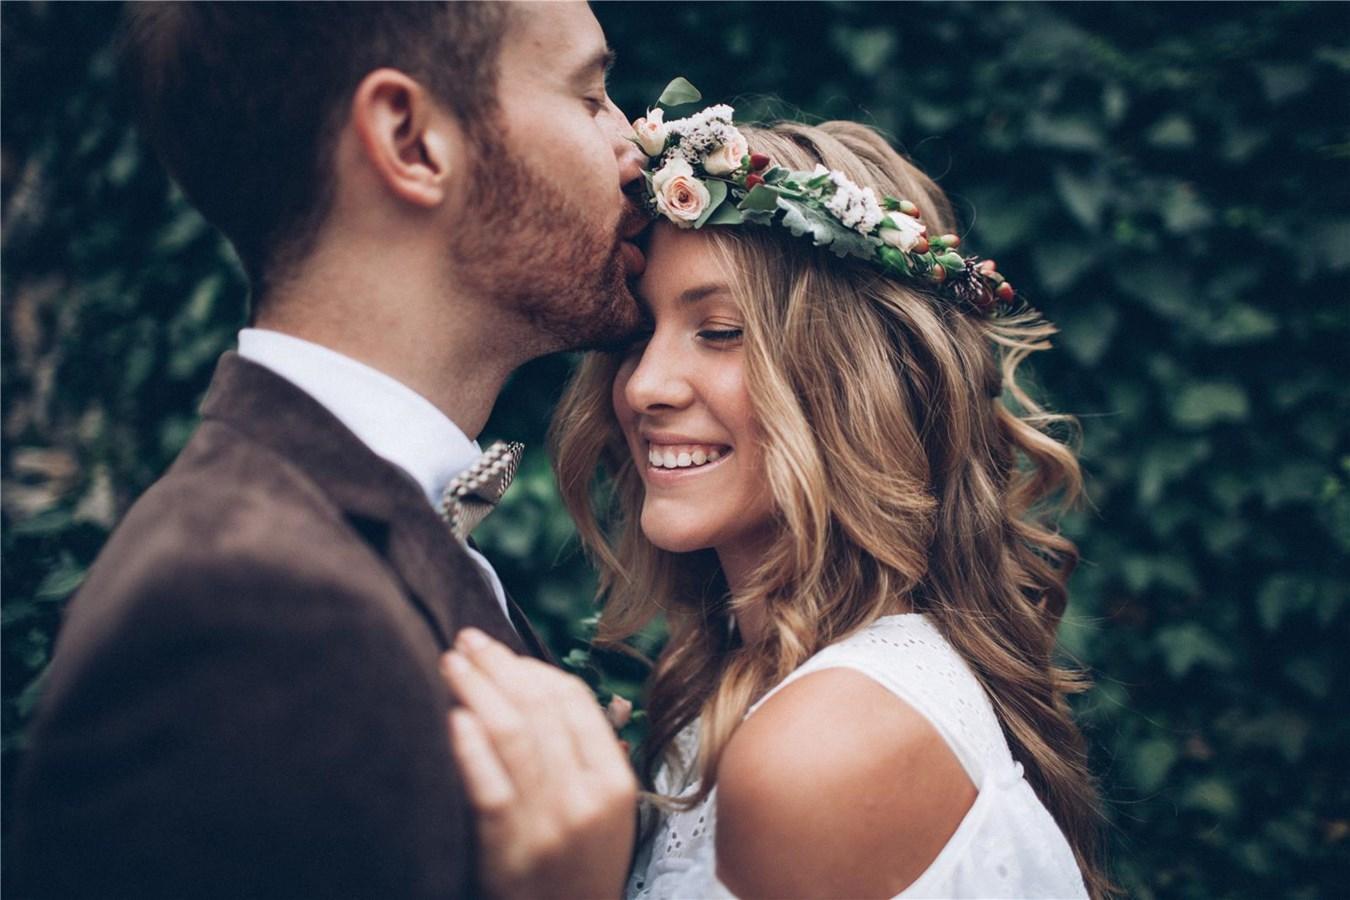 באדיבות Shutterstock